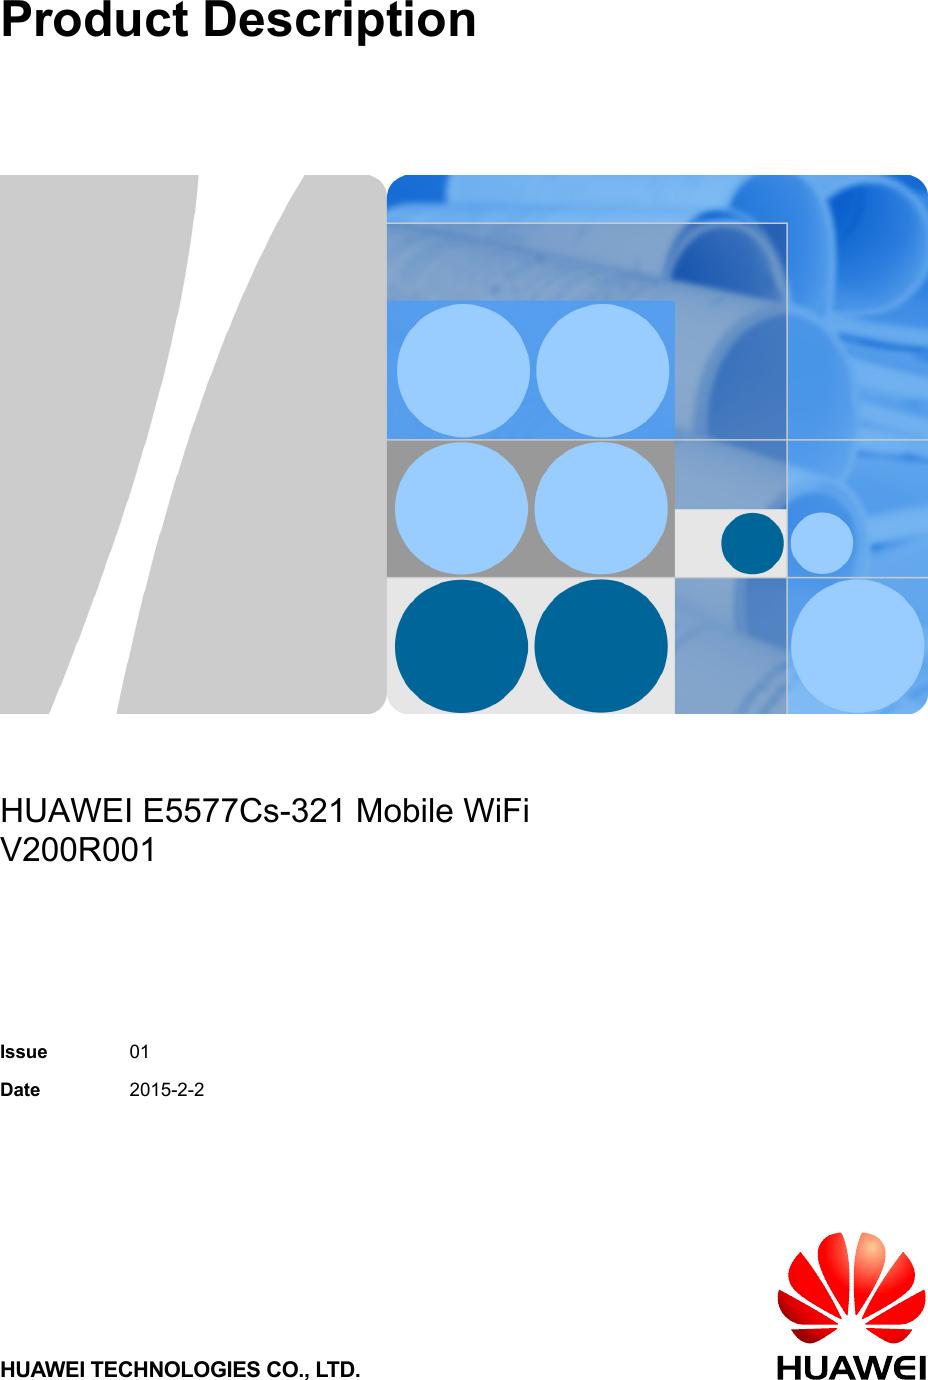 Huawei E5577Cs 321 Mobile WiFi Product Description